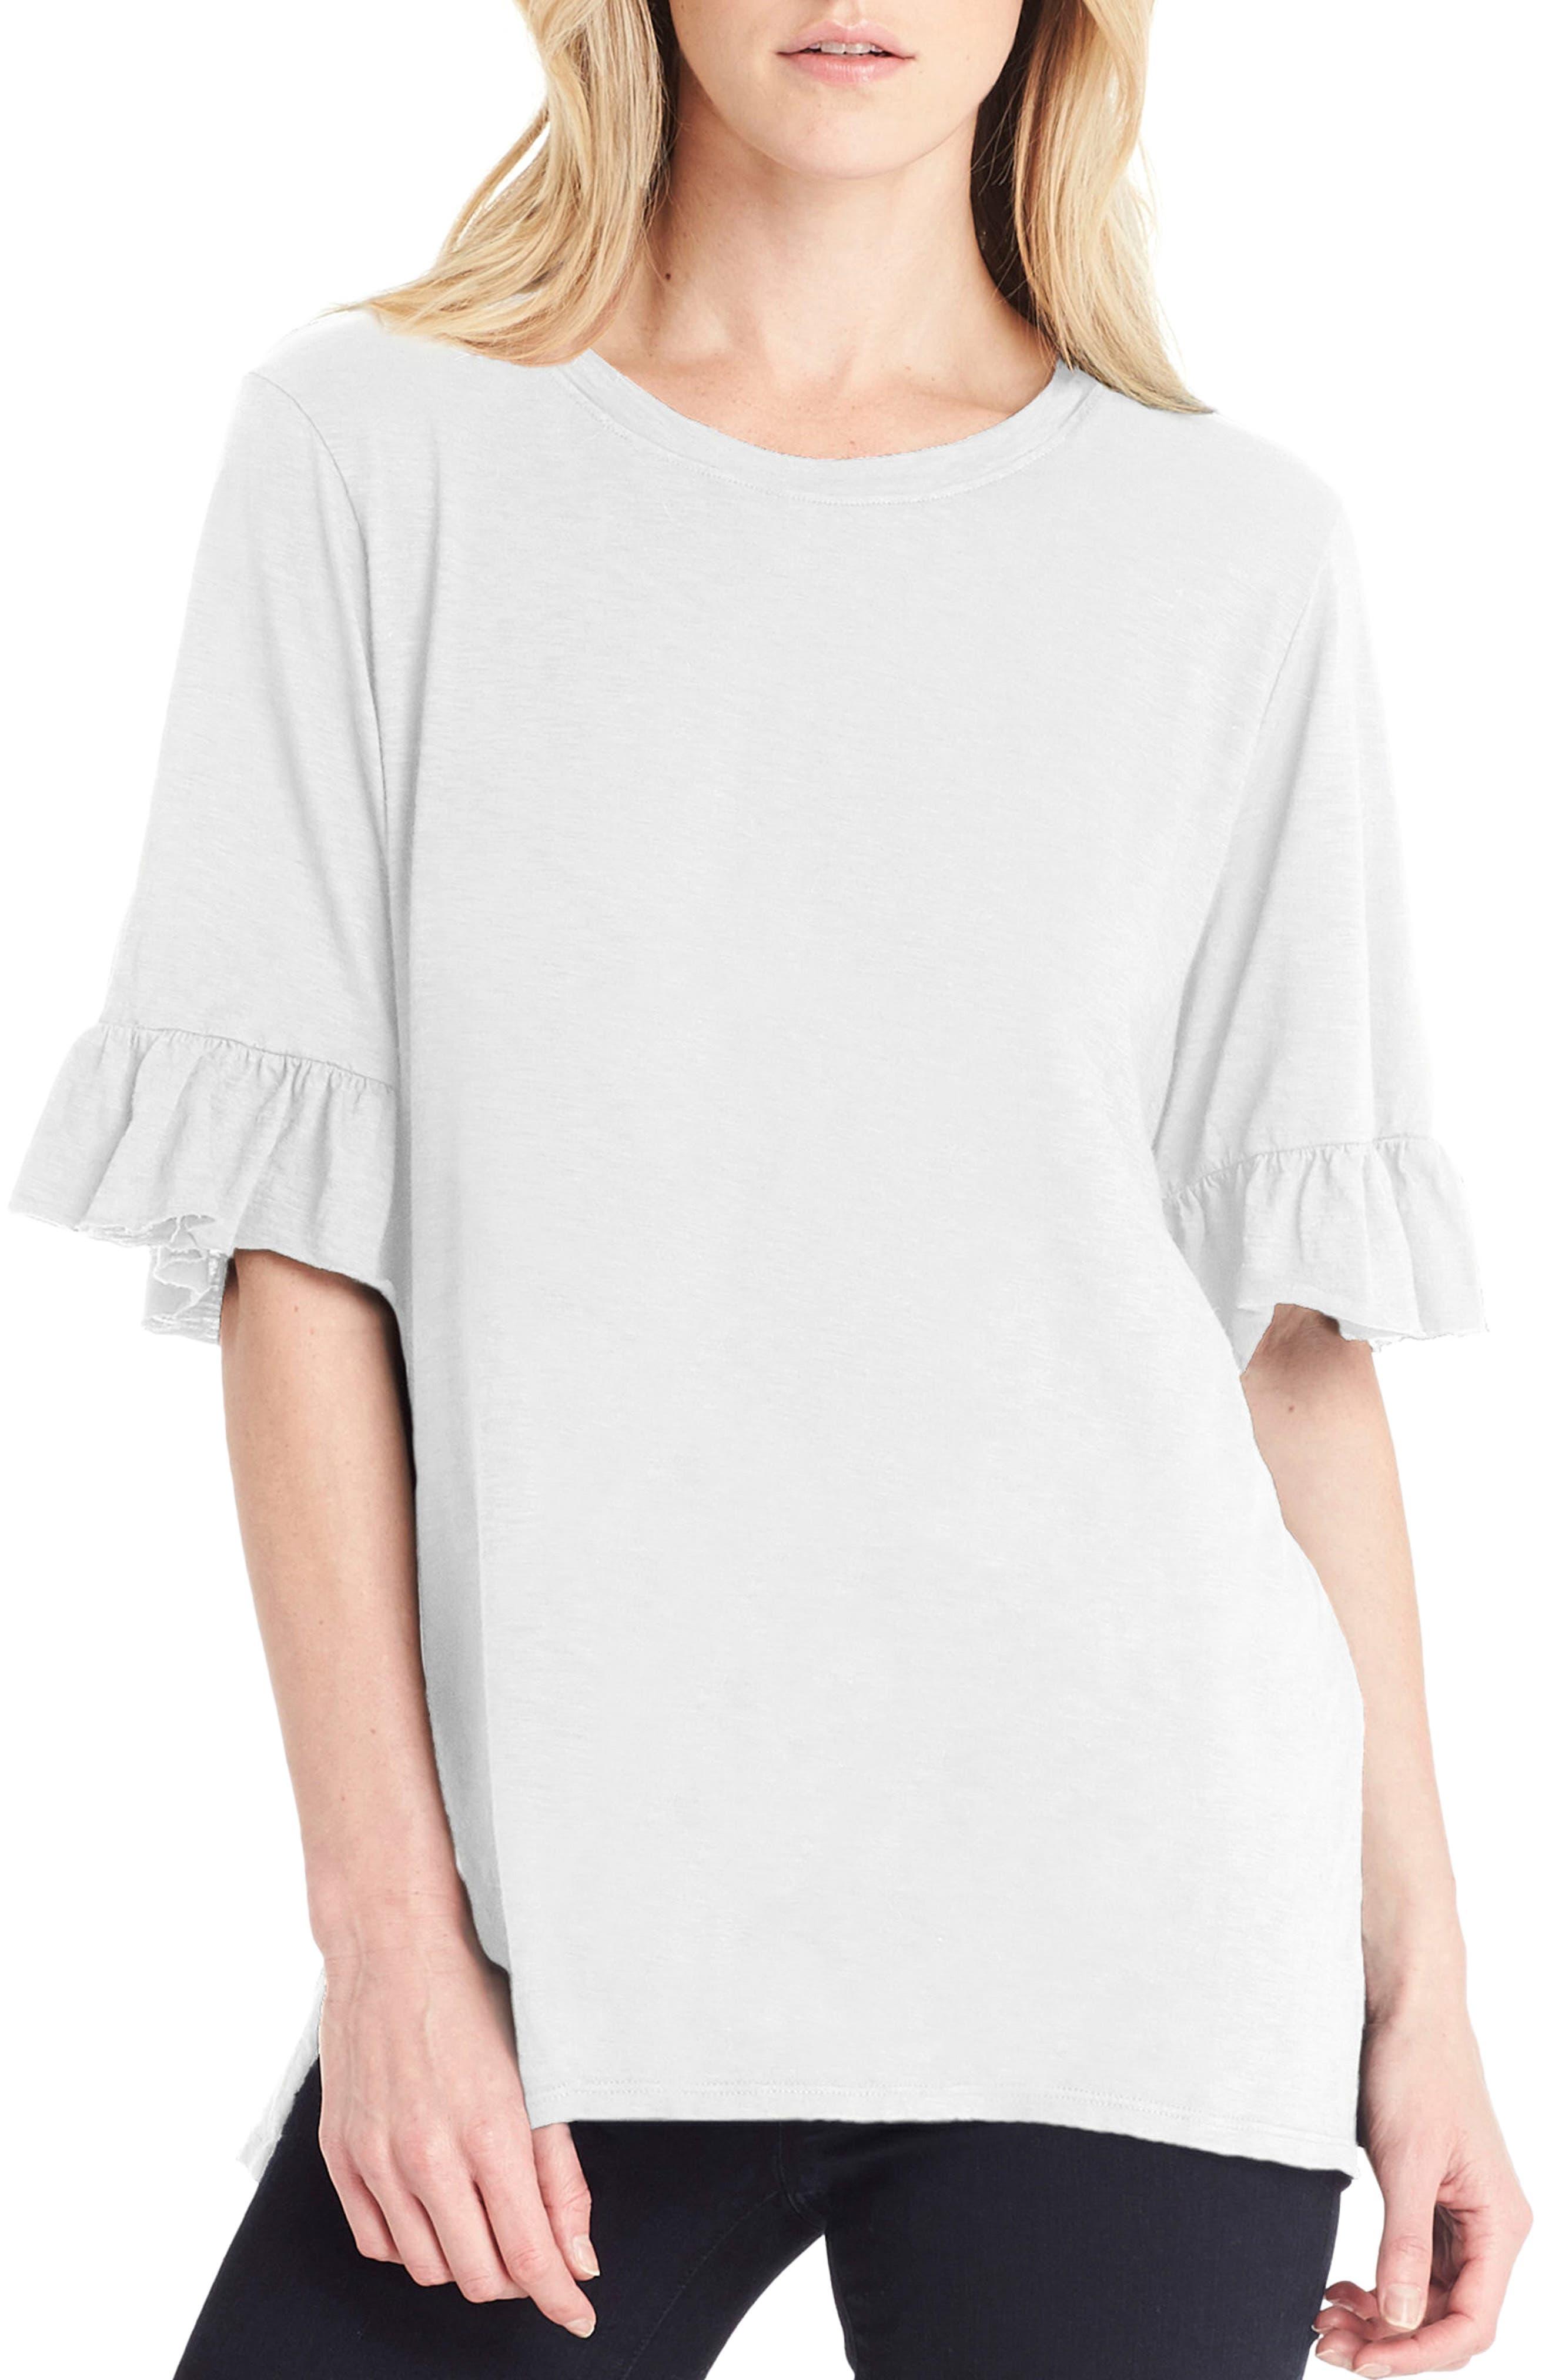 Ruffle Sleeve Top,                             Main thumbnail 1, color,                             White